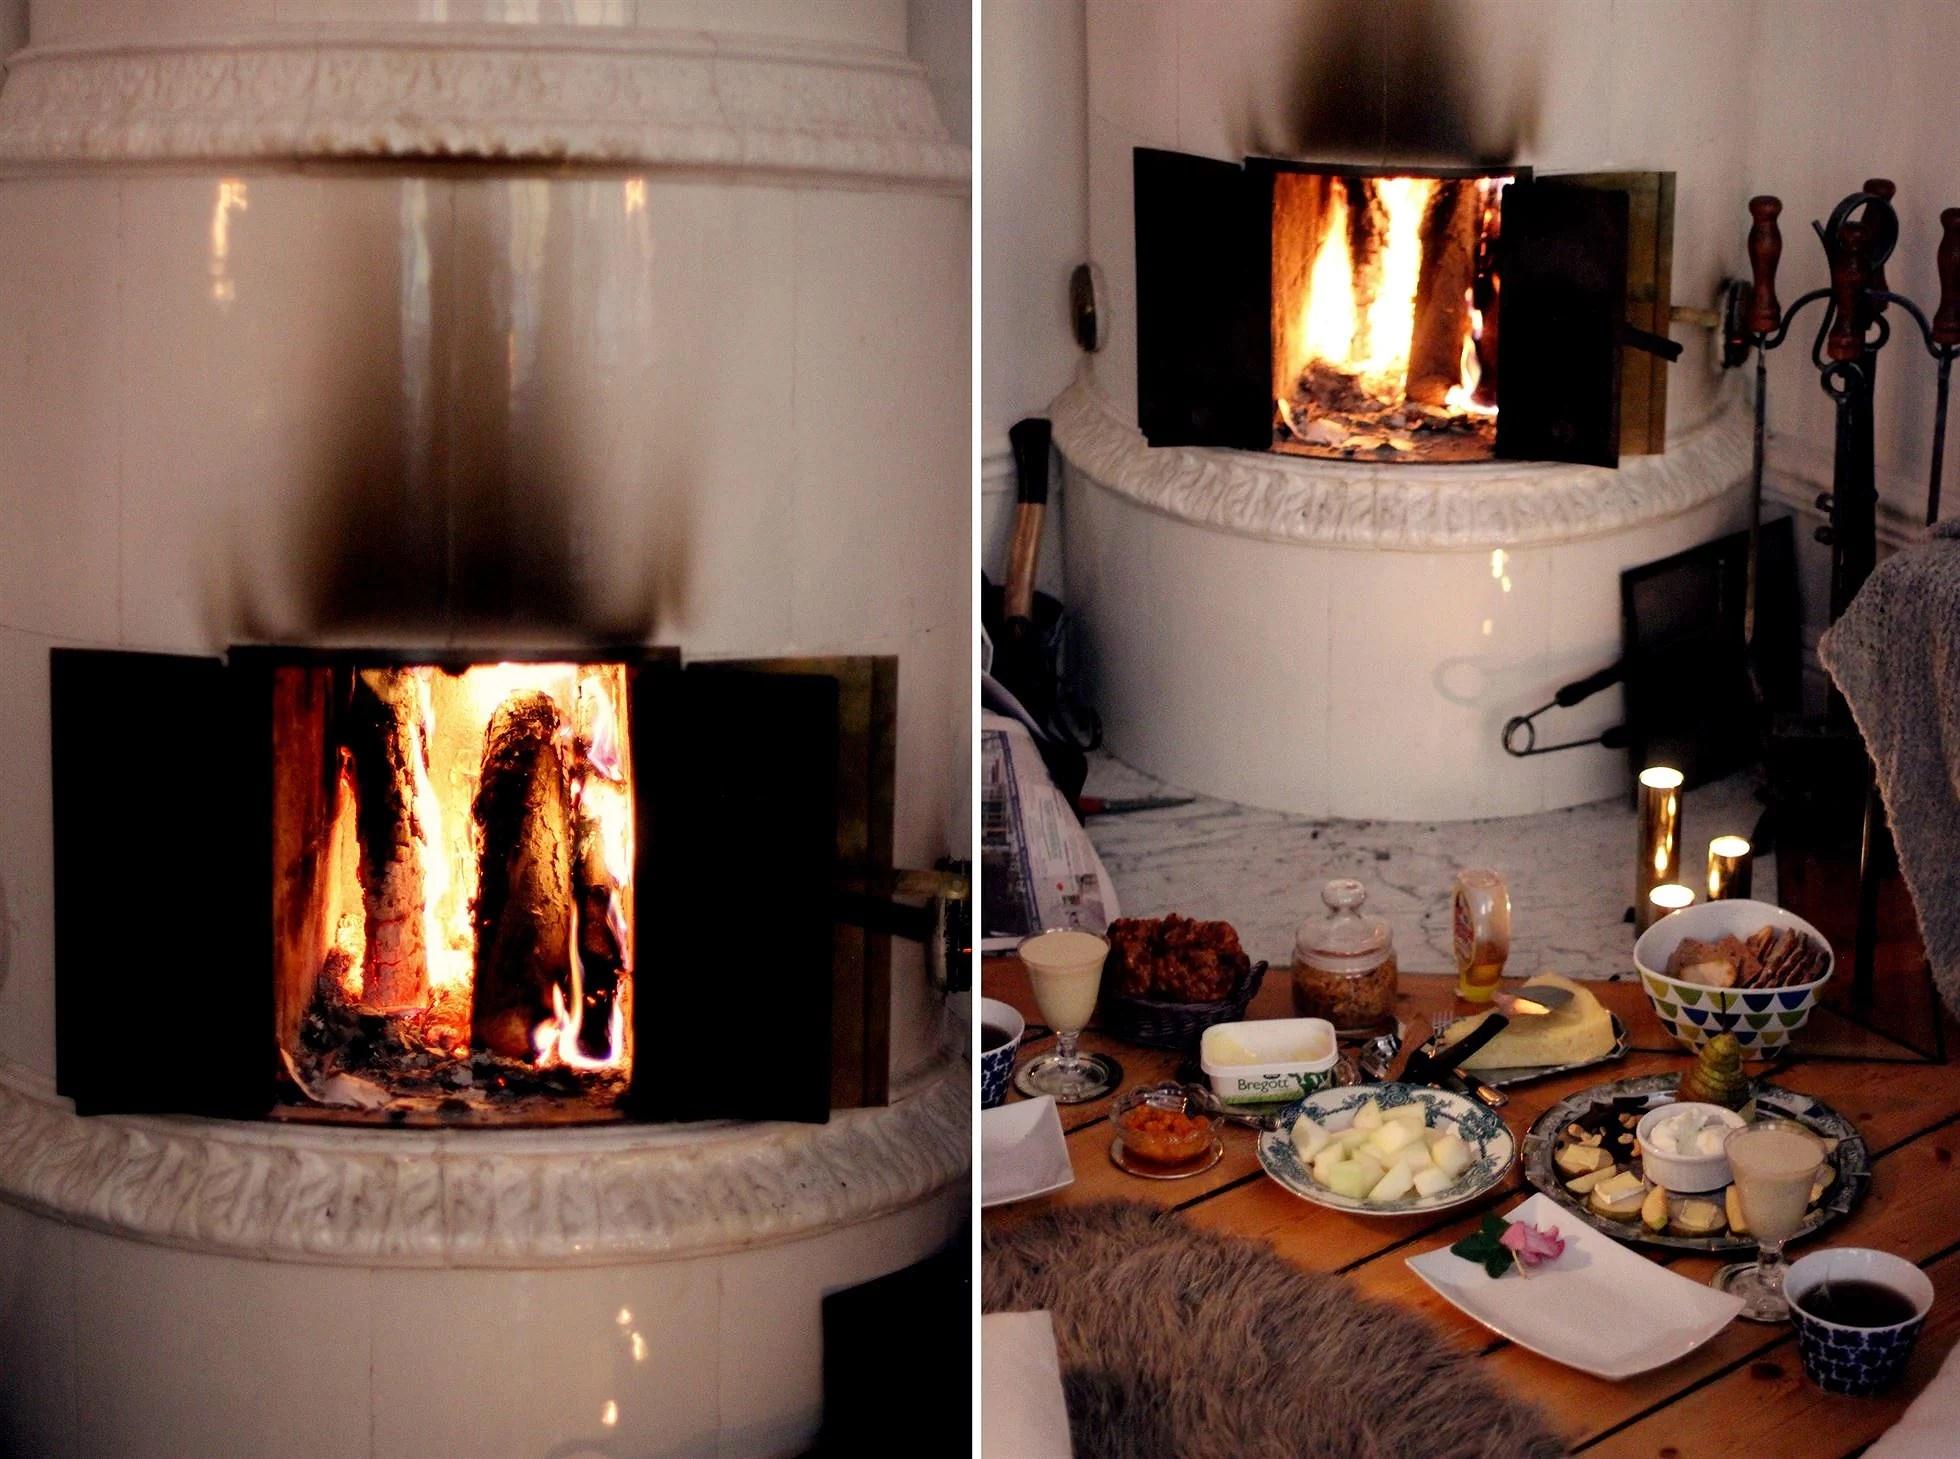 Vardagsbilder höst & vinter 20141(2)